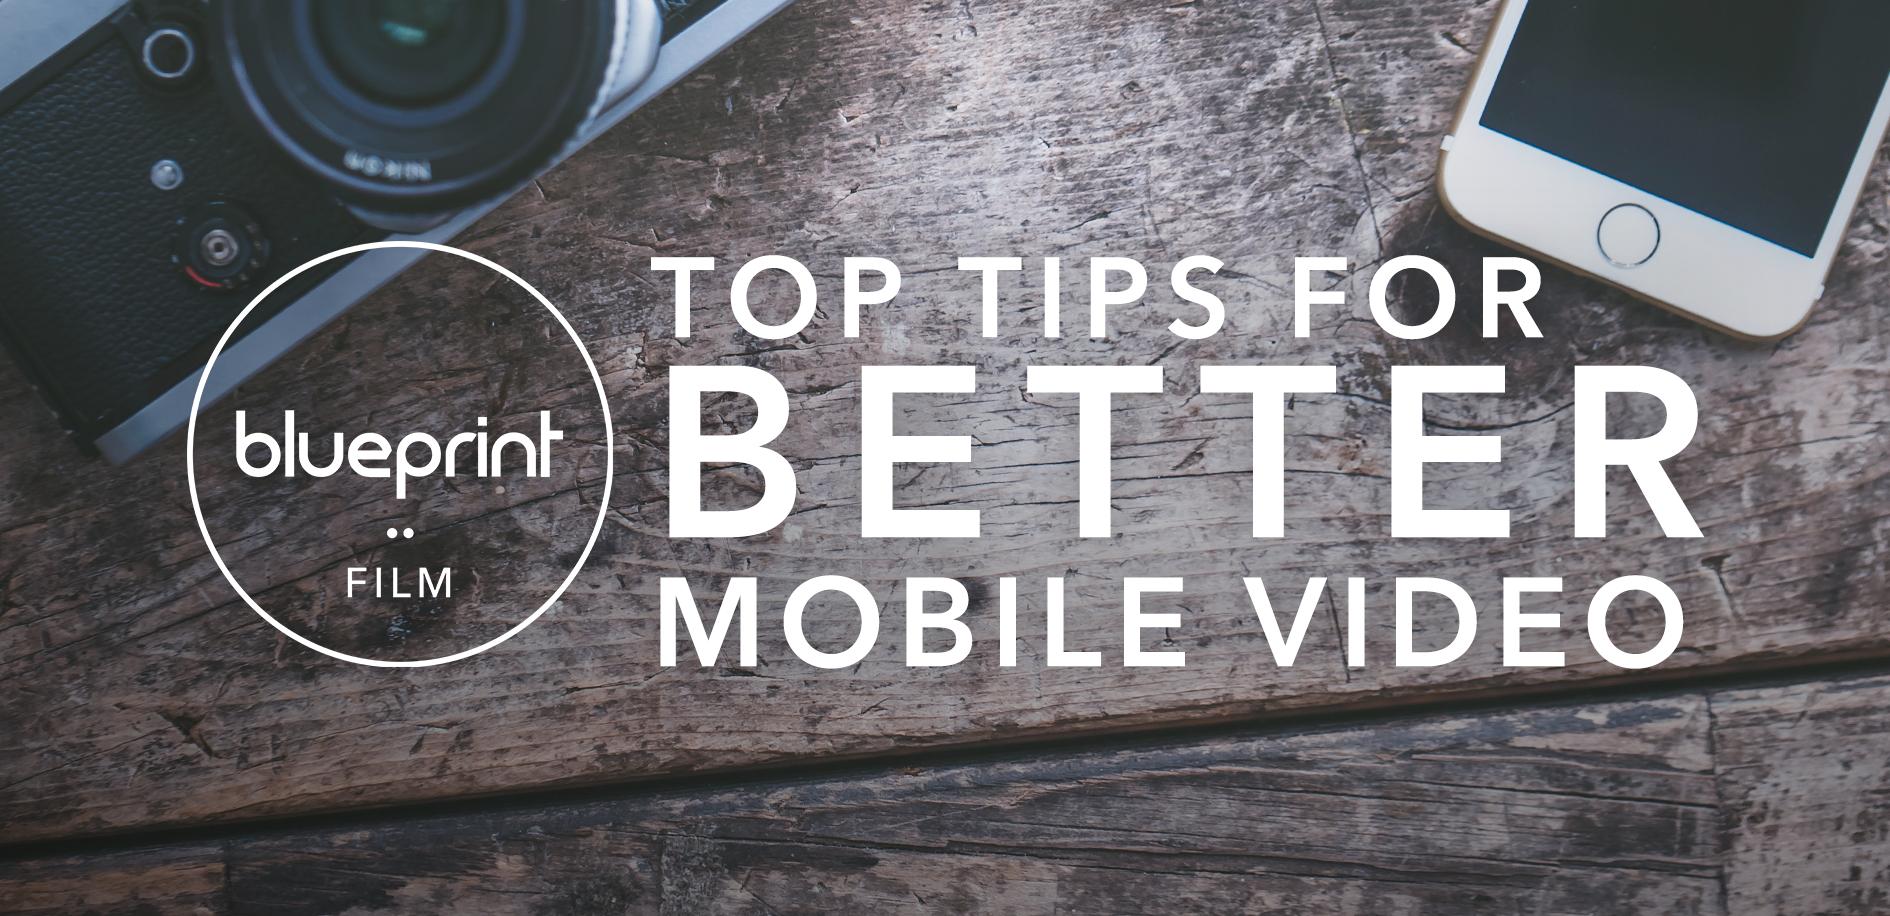 Mobile video tips blog